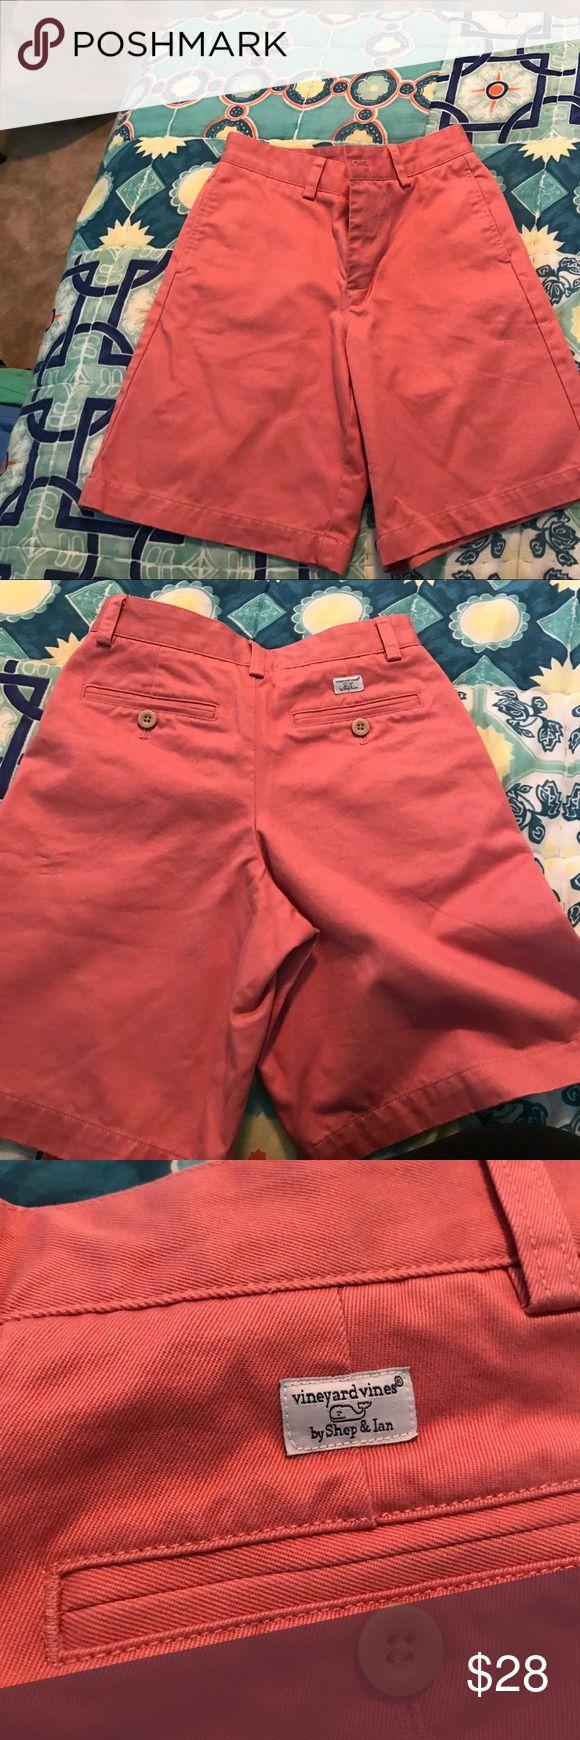 Vineyard Vines Boys shorts Gently used light salmon boys shorts! Perfect for the upcoming season. Vineyard Vines Bottoms Shorts